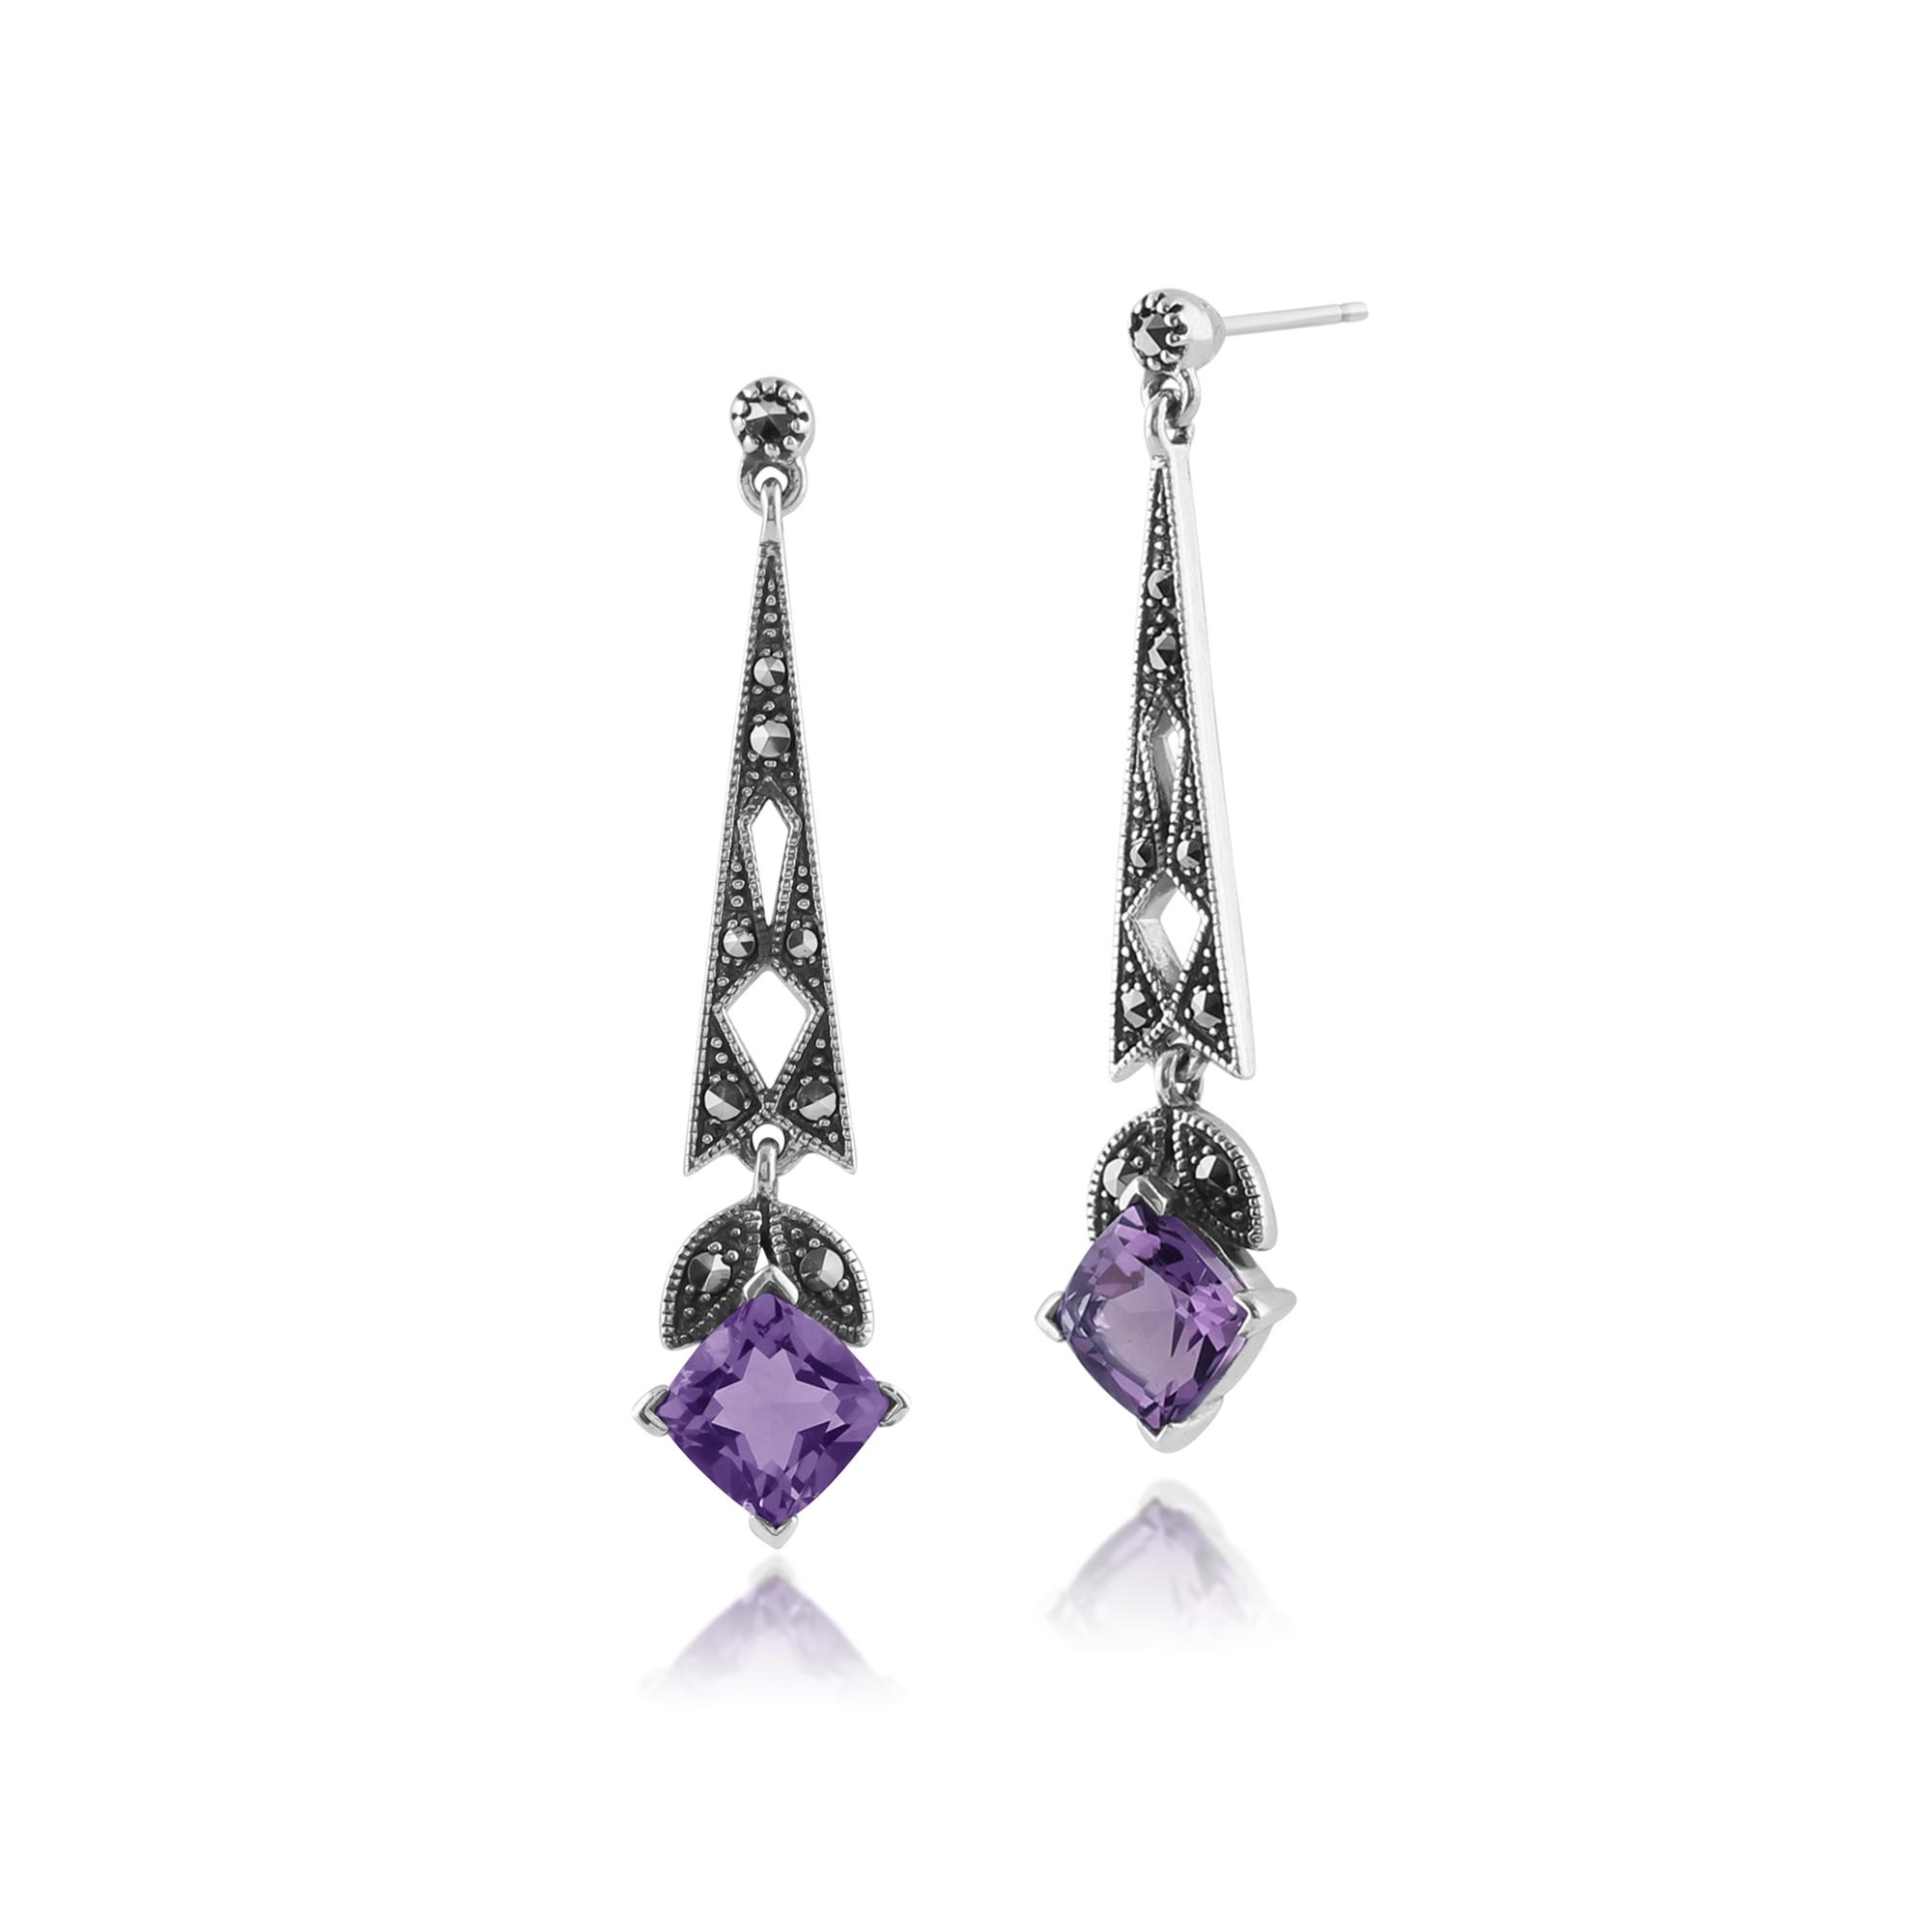 925 sterling silver amethyst marcasite art deco statement drop earrings. Black Bedroom Furniture Sets. Home Design Ideas